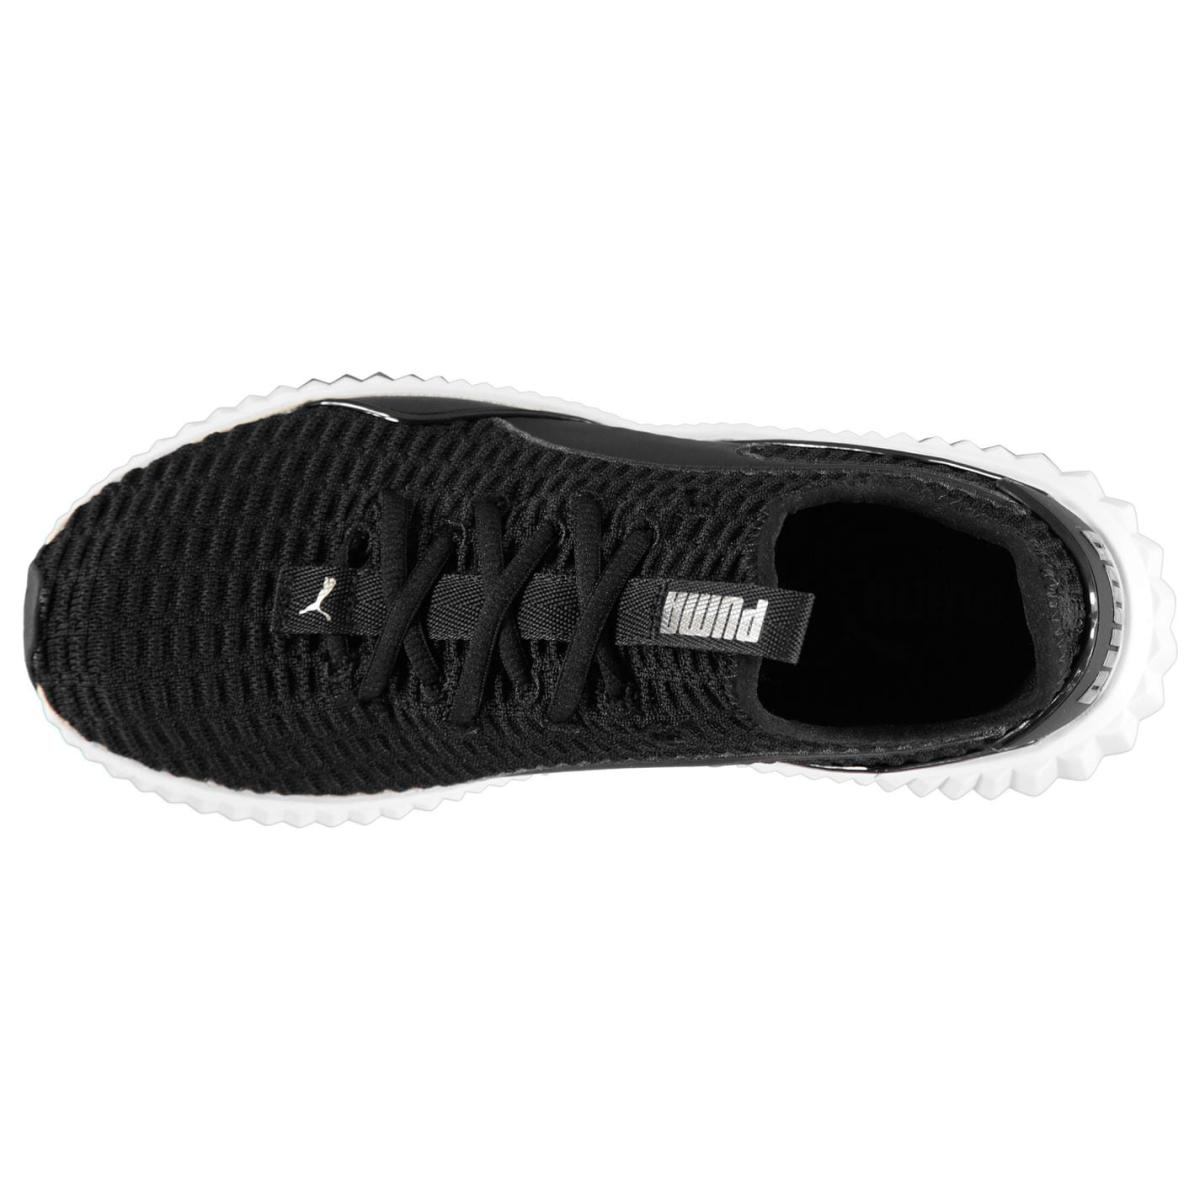 Puma-Defy-Turnschuhe-Damen-Sneaker-Sportschuhe-Laufschuhe-9005 Indexbild 10